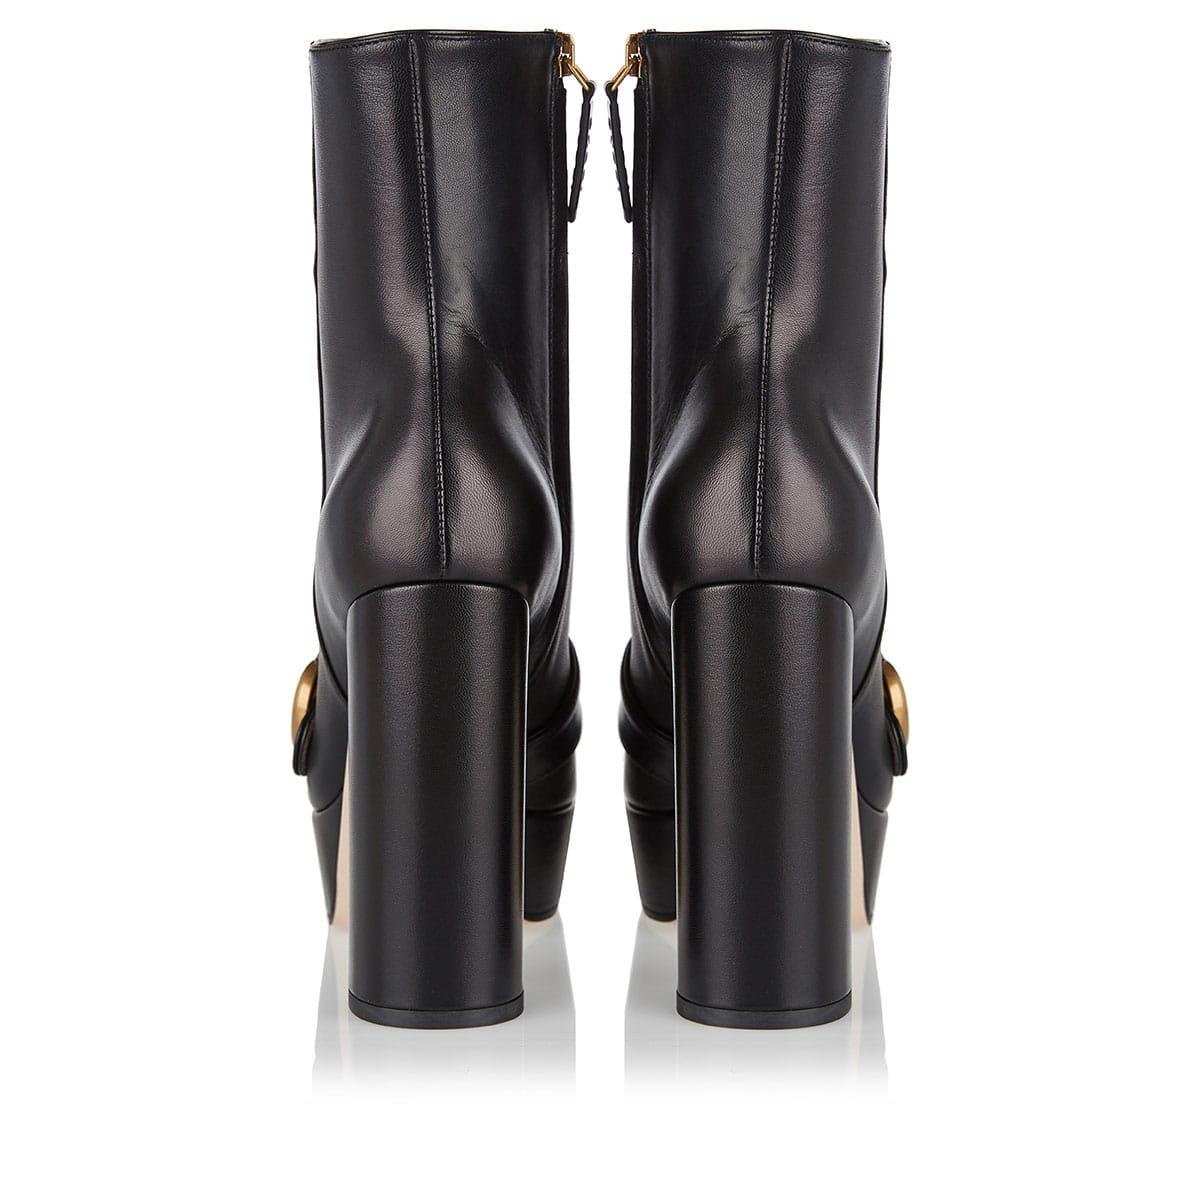 GG platform ankle boots